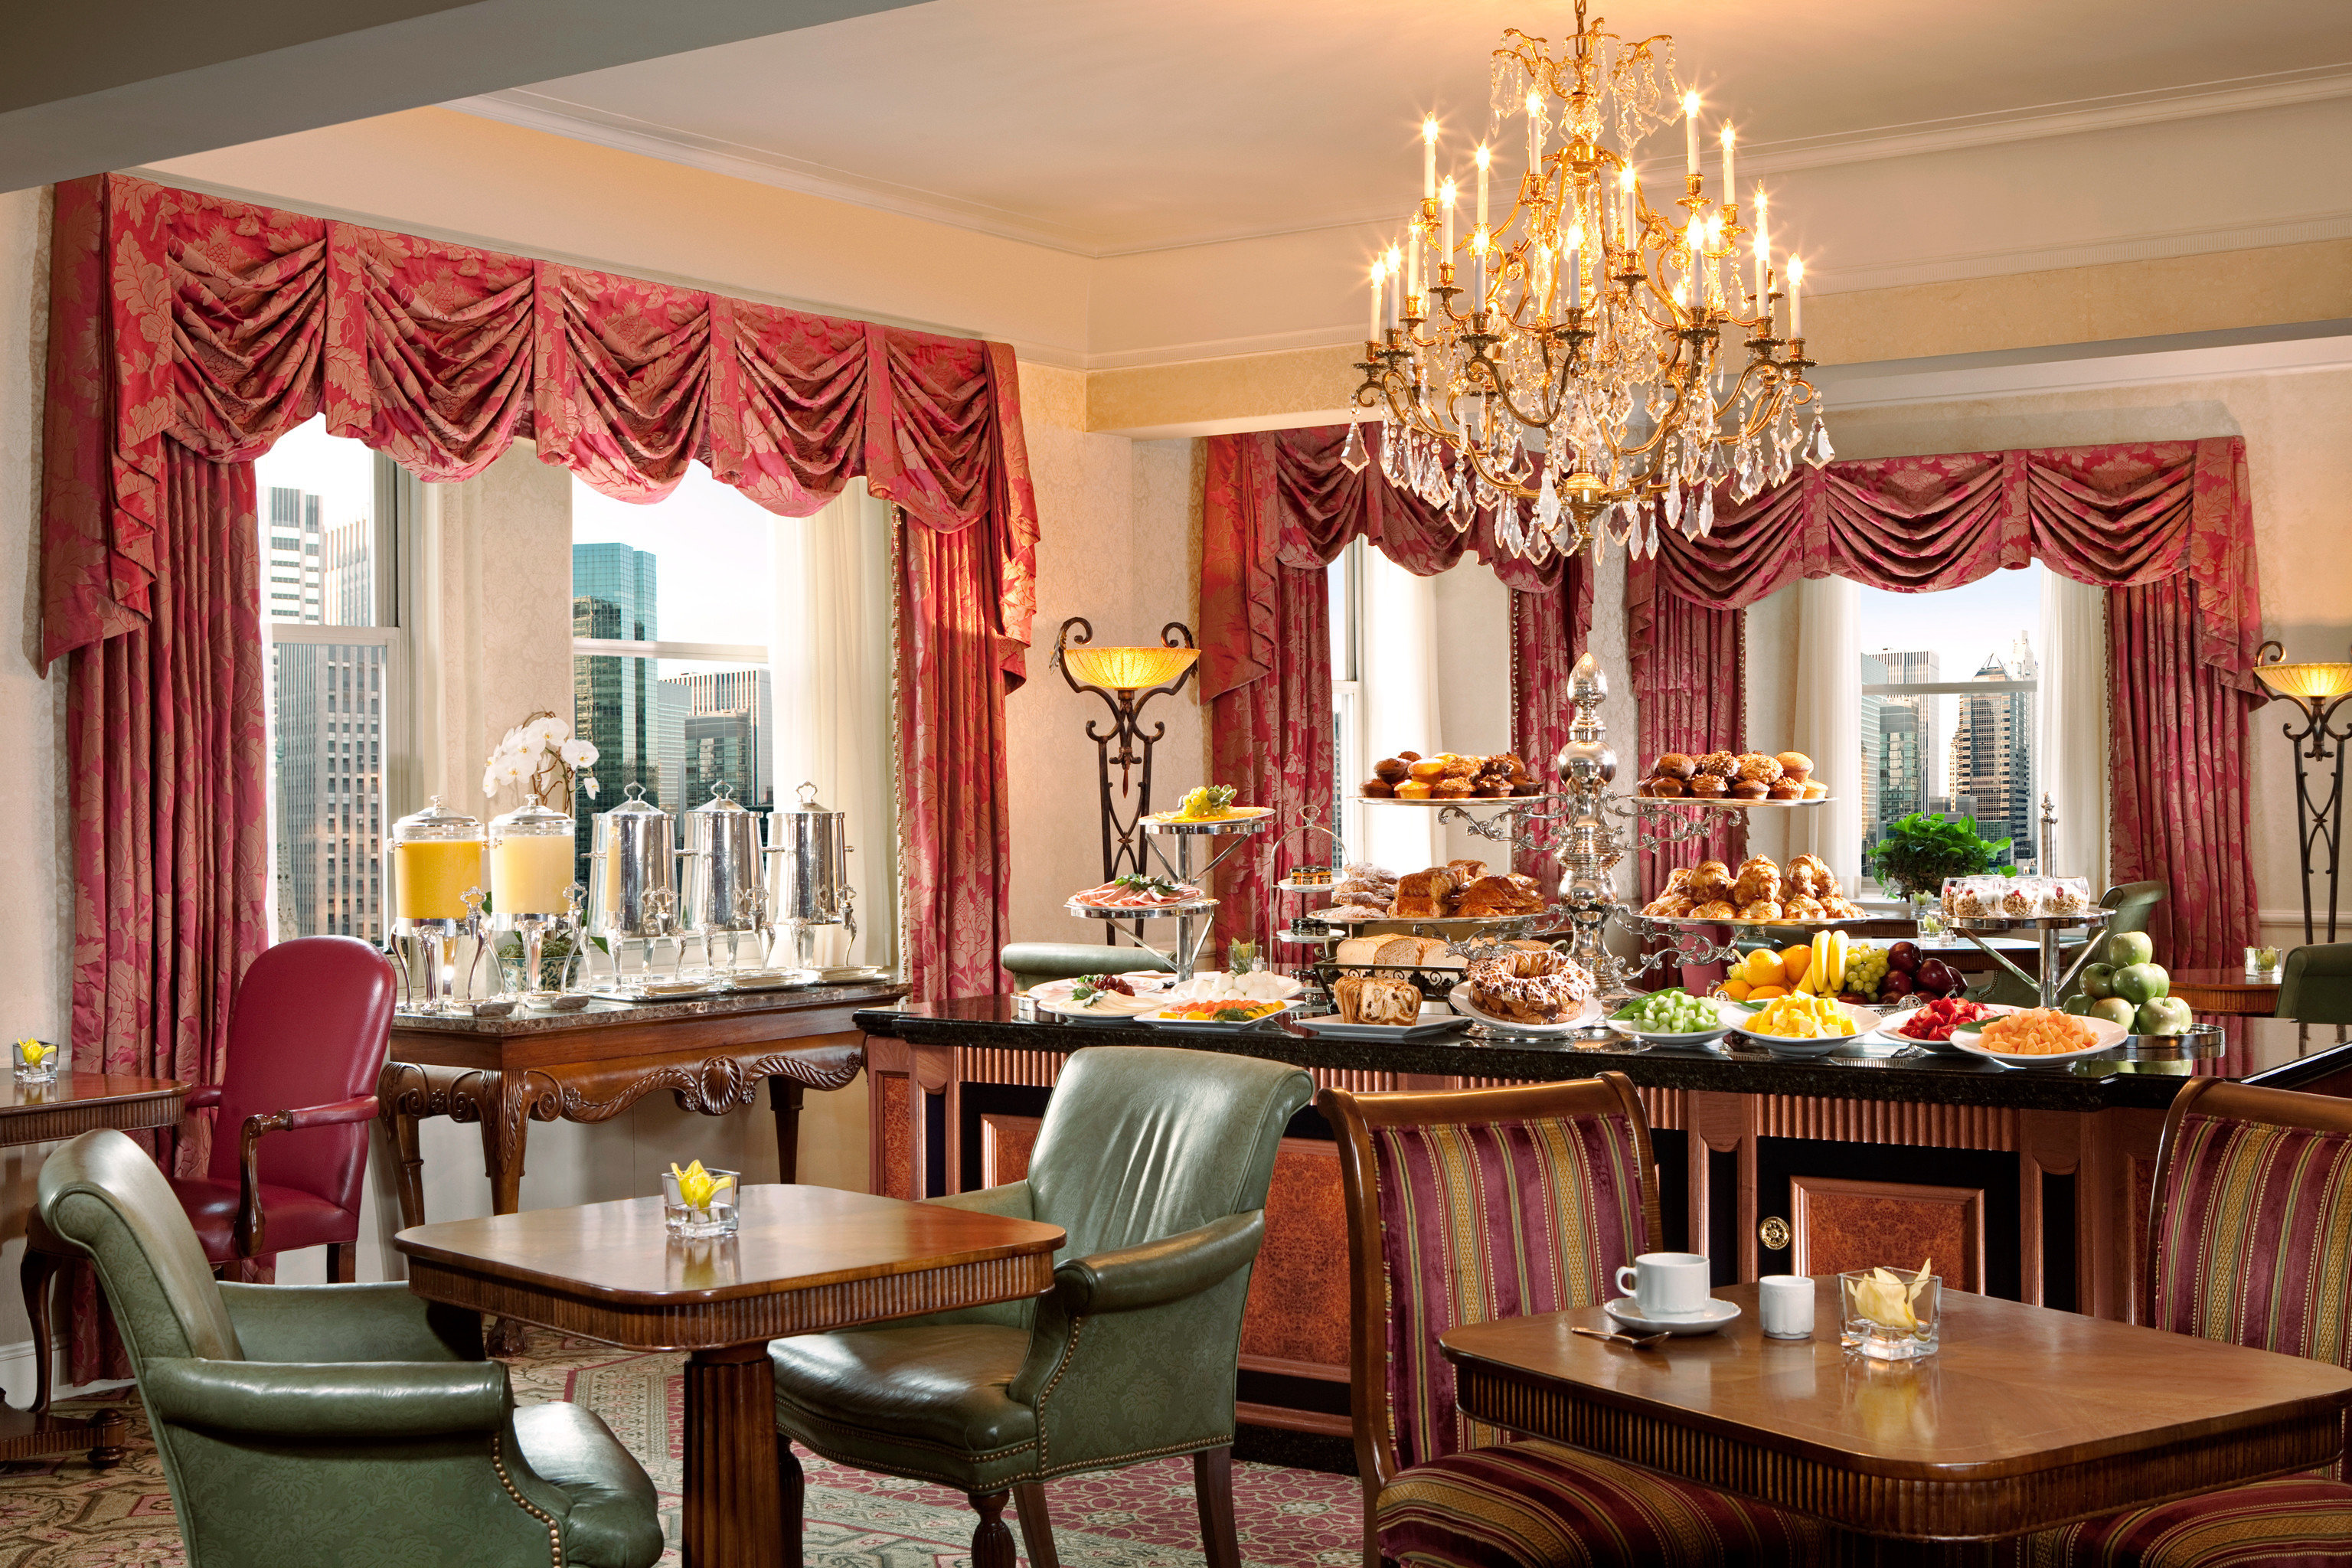 Bar Dining Drink Eat Elegant Historic chair living room dining table